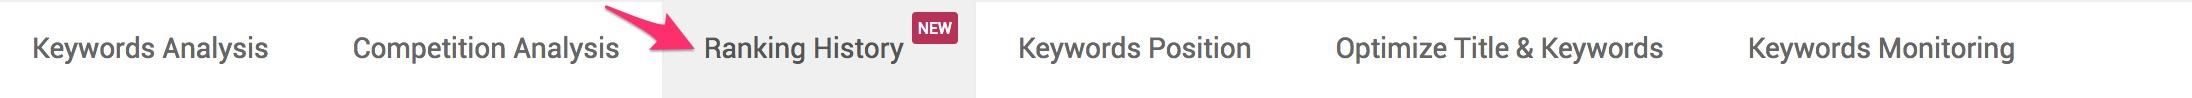 keywords-ranking-new.jpg